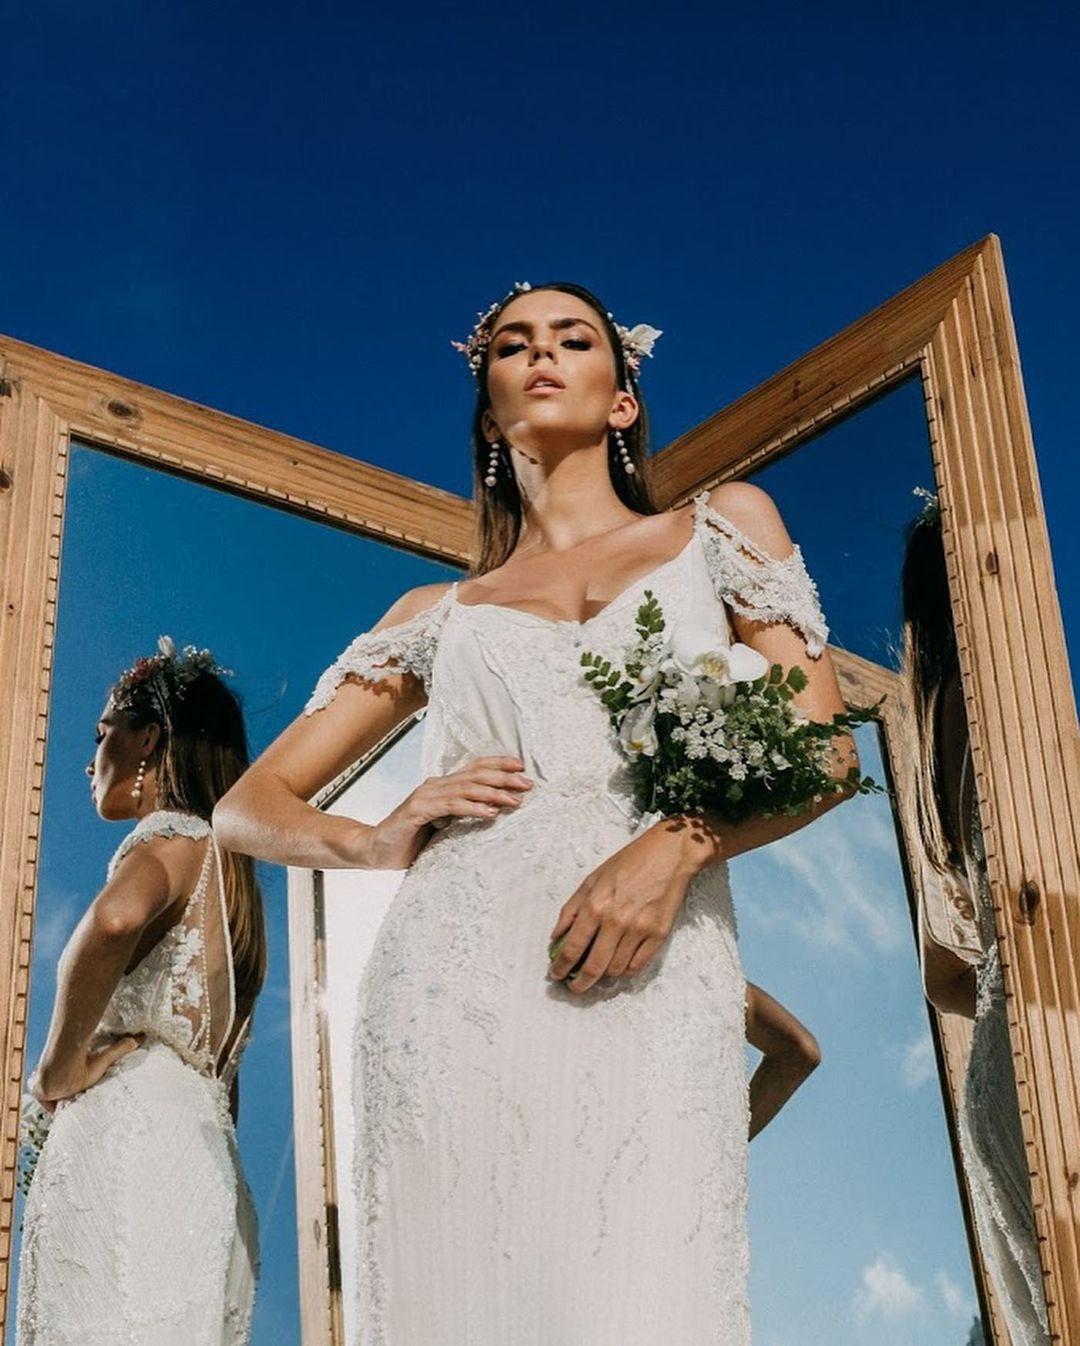 ana flavia giacomini, miss ilha dos lobos mundo 2019. - Página 9 Fwwprf10